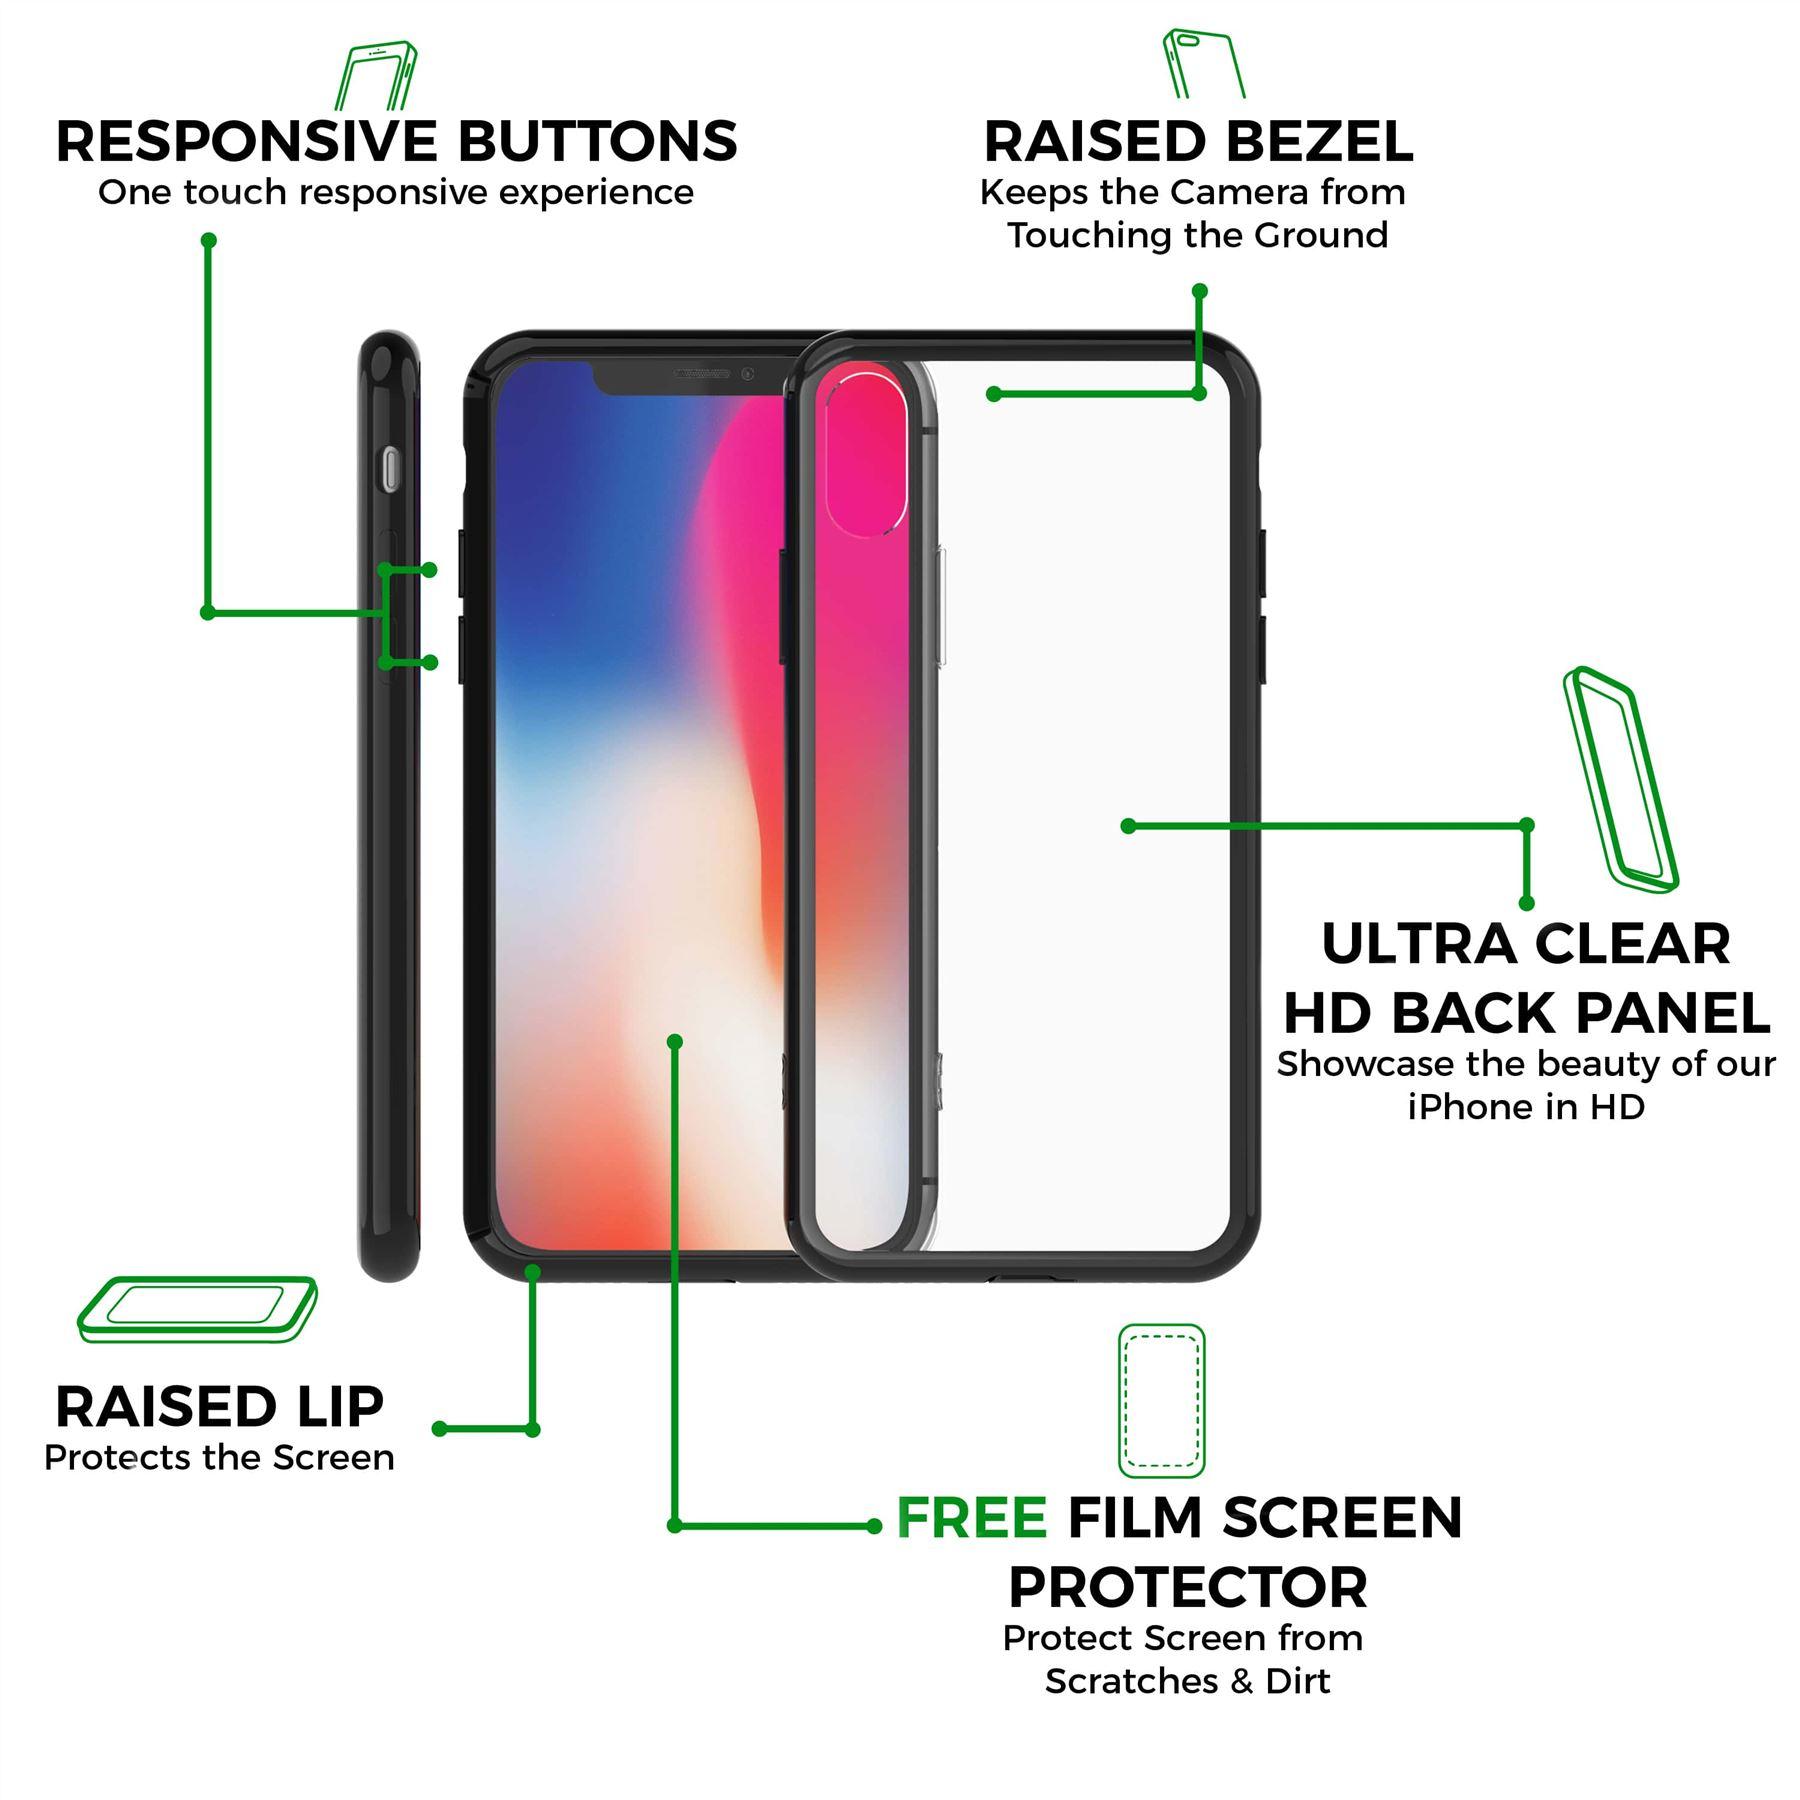 thumbnail 9 - For Apple iPhone XR Xs Max X 8 7 Plus 6 5 Se Case Cover Clear Transparent CS283